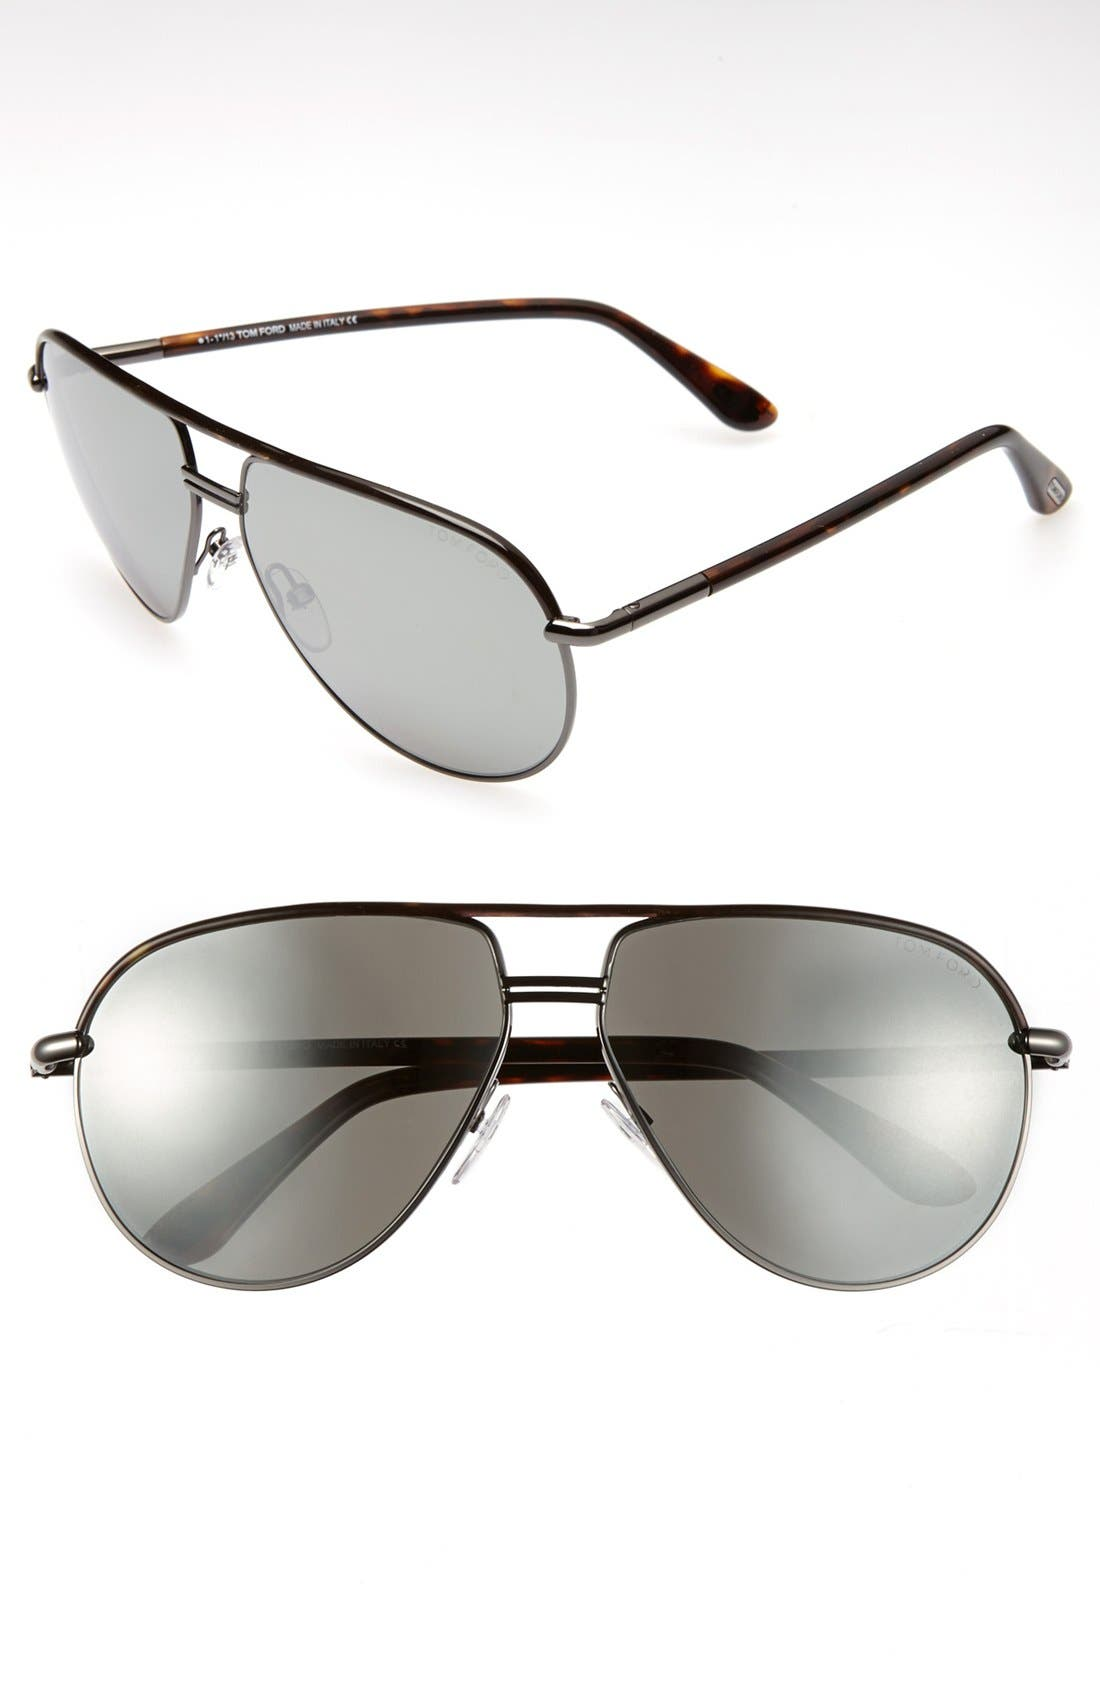 Main Image - Tom Ford Cole 61mm Sunglasses